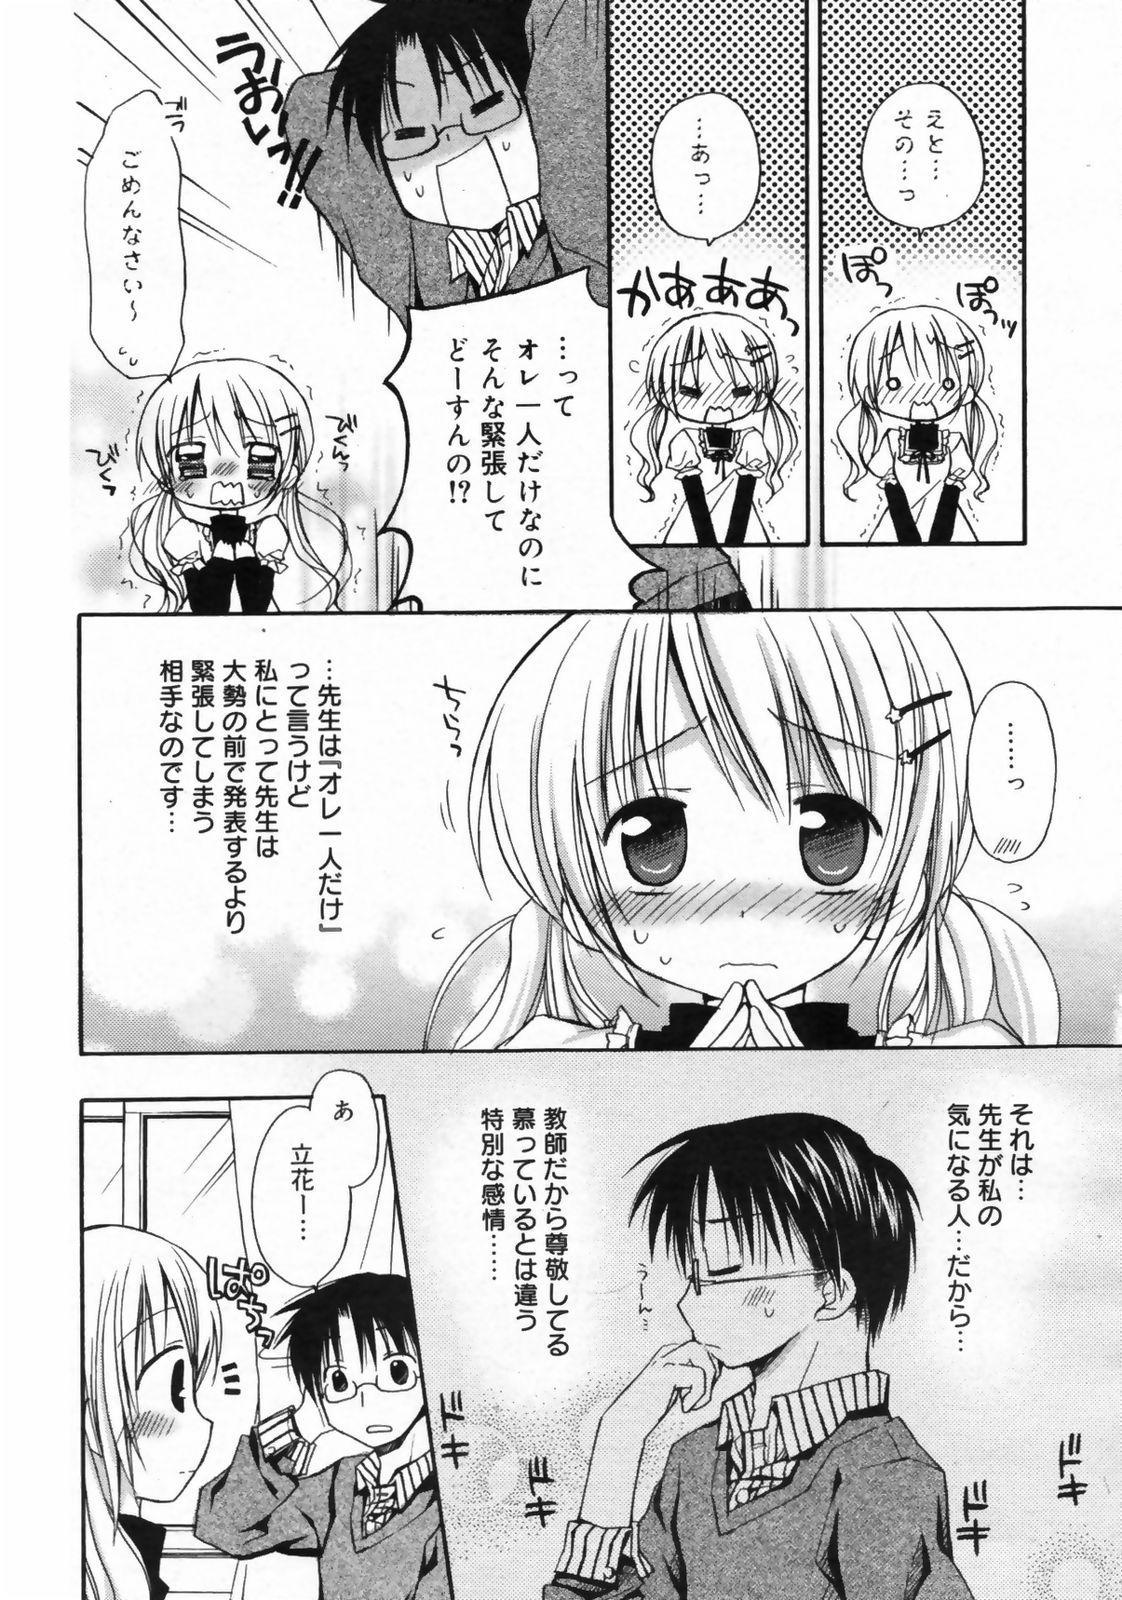 Manga Bangaichi 2009-02 Vol. 234 23